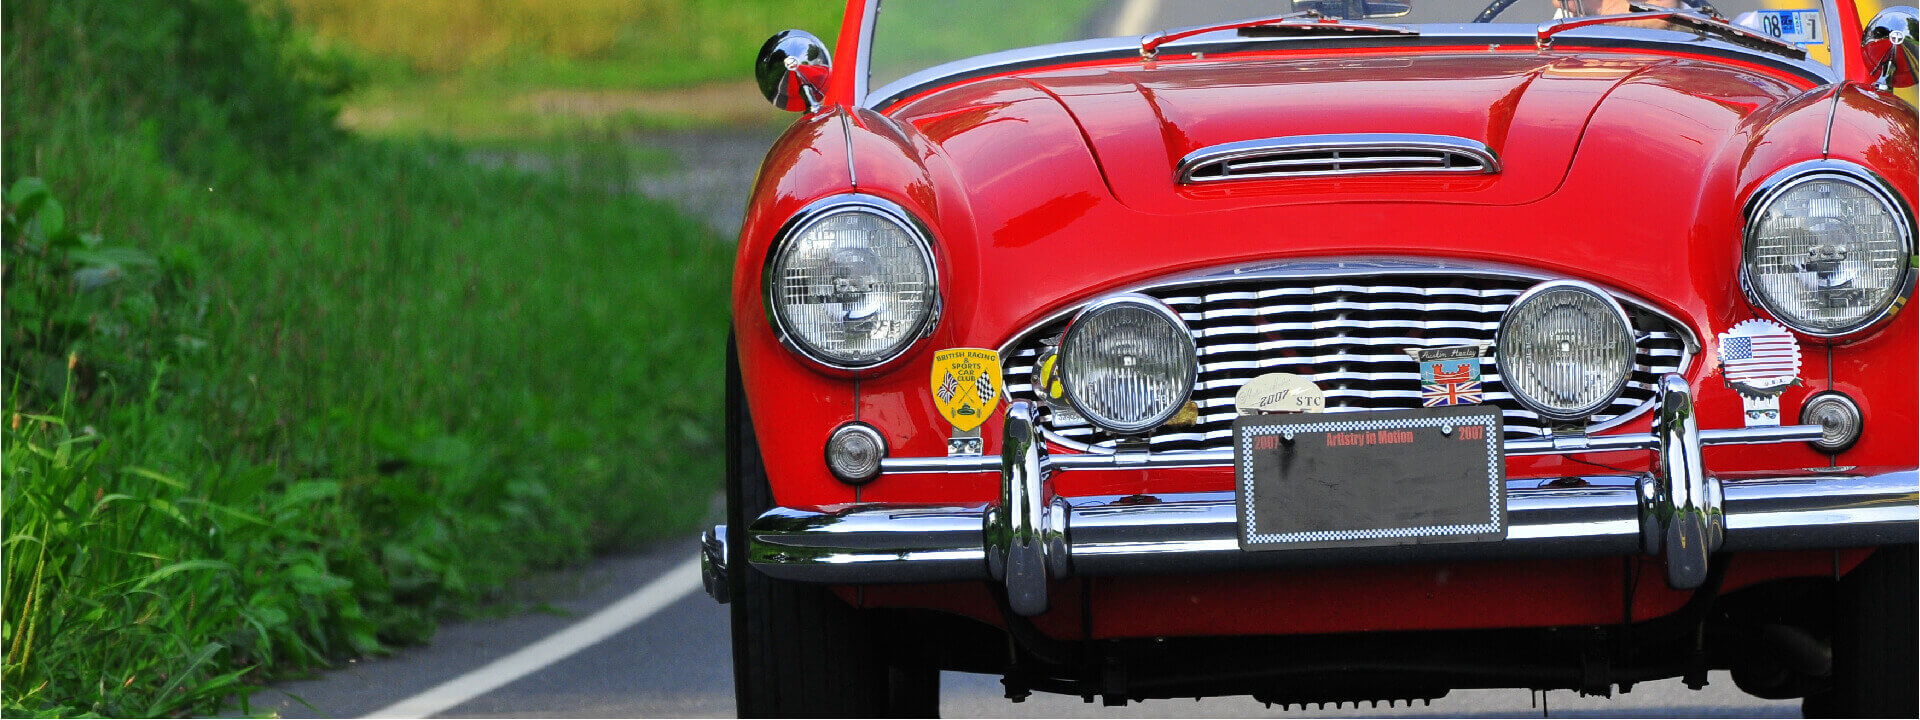 Classic-cars-Images_3.2.2-AUSTIN.jpg